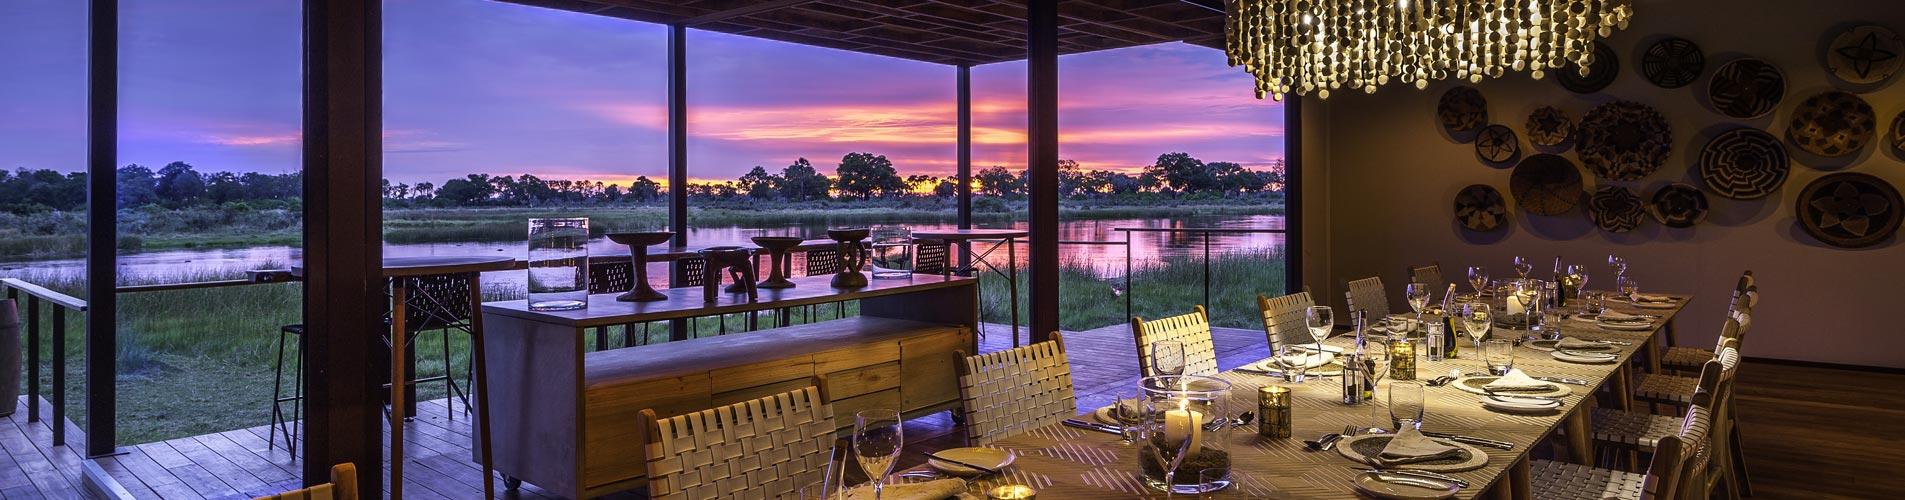 Qorokwe in Botswana